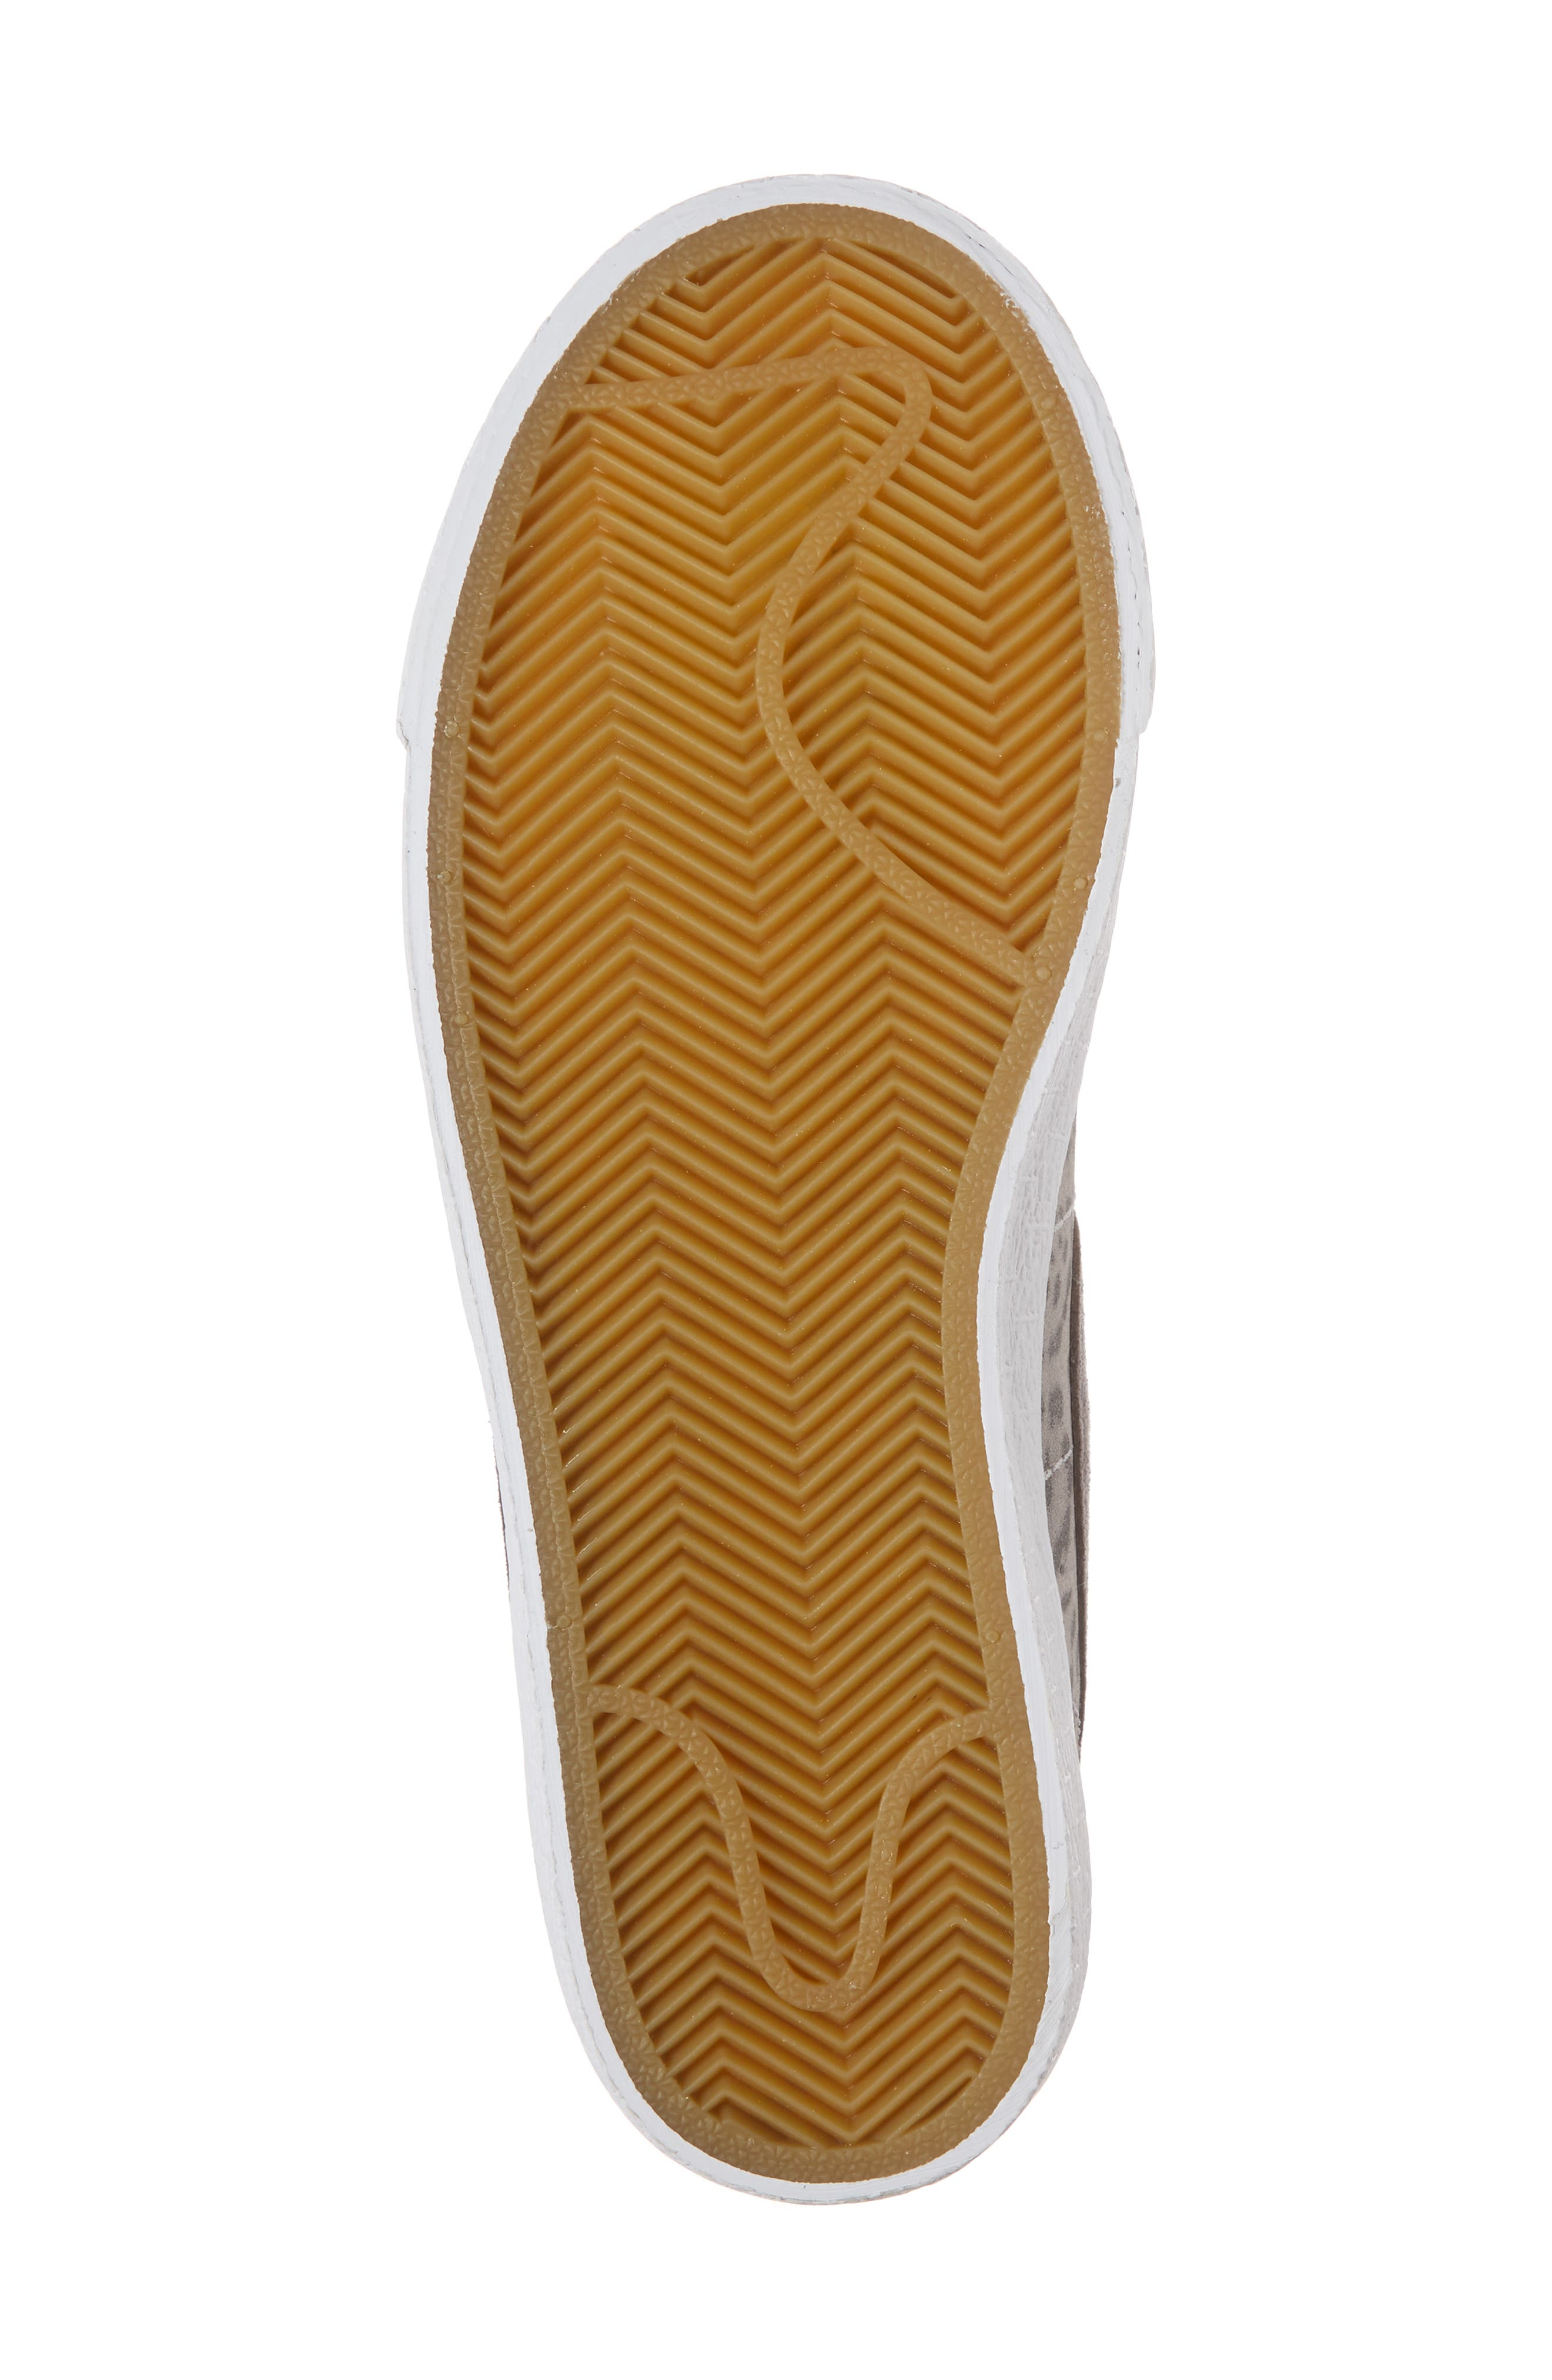 Blazer Mid SE High Top Sneaker,                             Alternate thumbnail 6, color,                             Atmosphere Grey/ Smoke/ Gum